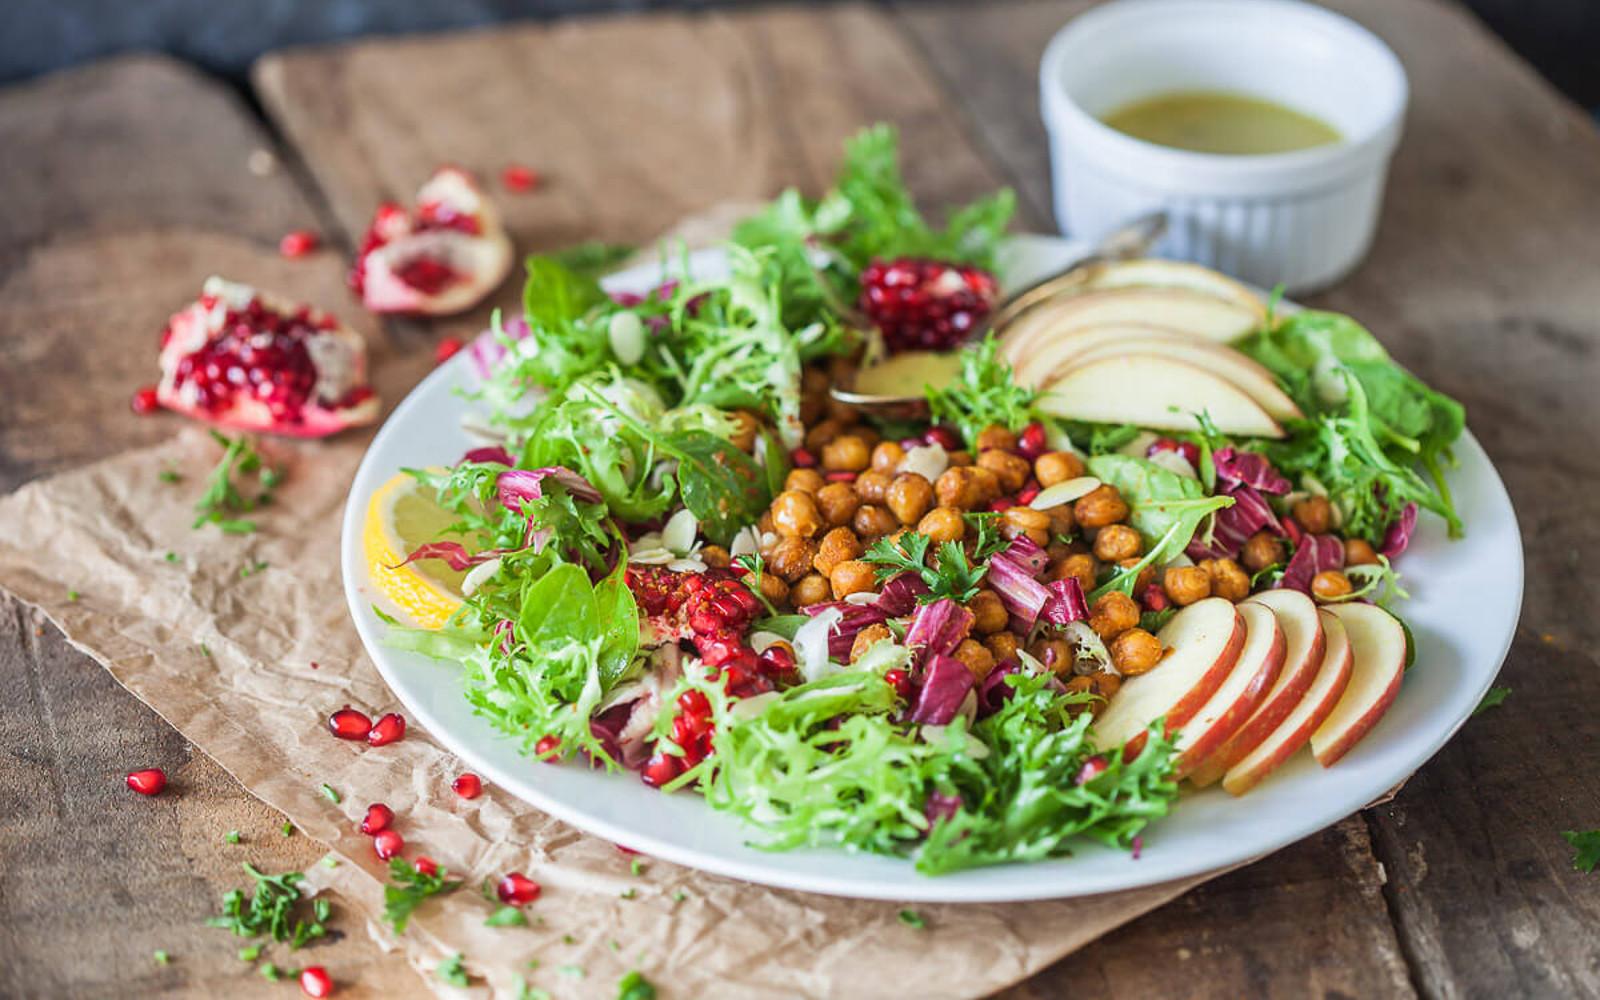 Vegan Grain-Free Endive Salad With Crispy Chickpeas